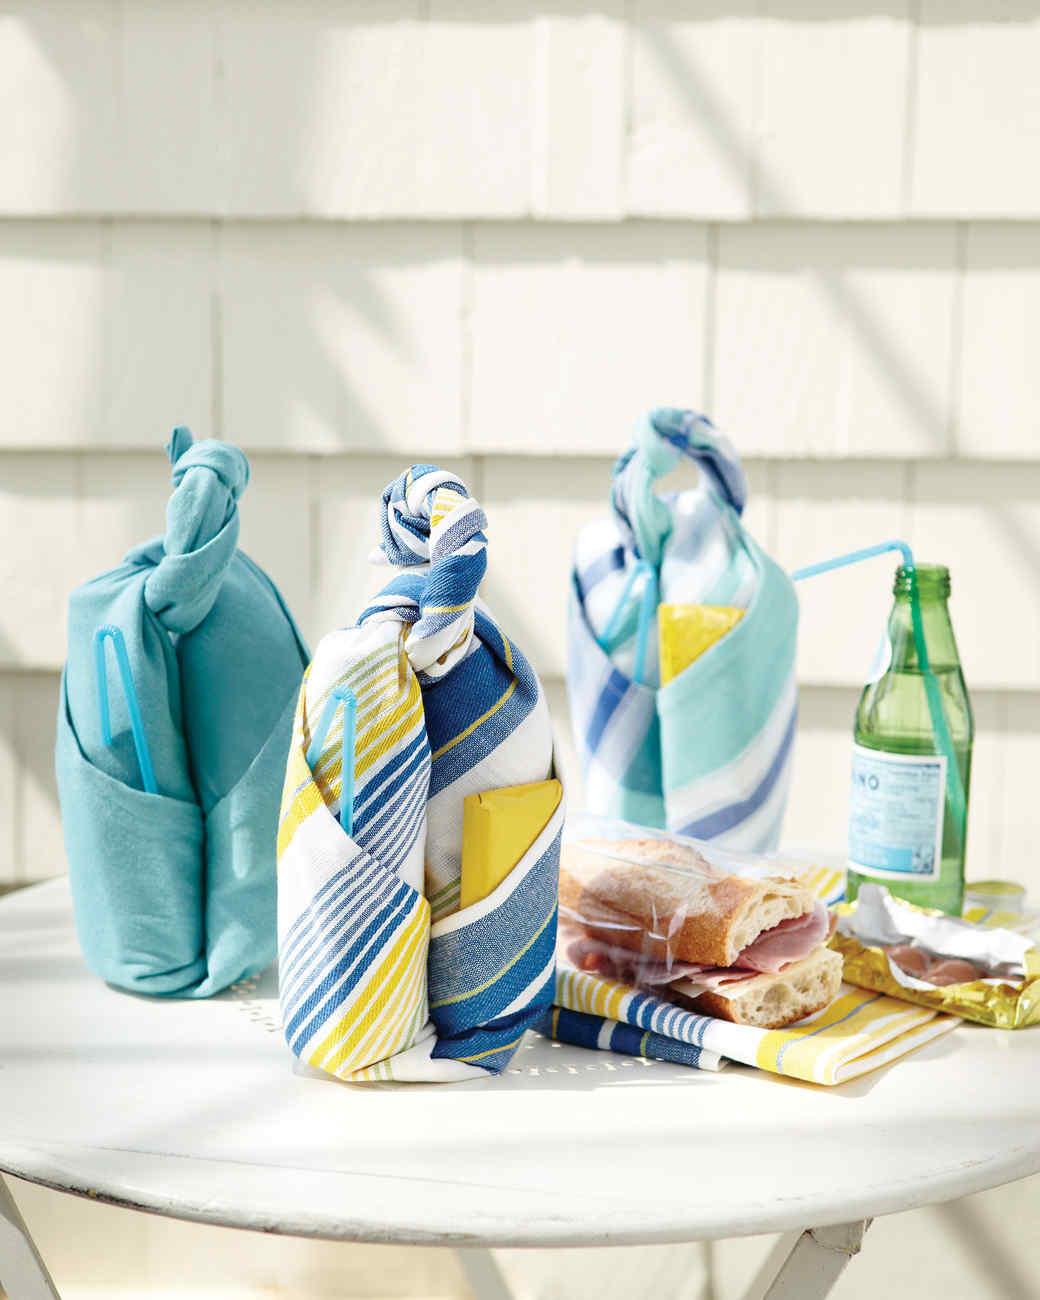 martha stewart kitchen towels standard sink size dish towel picnic carrier